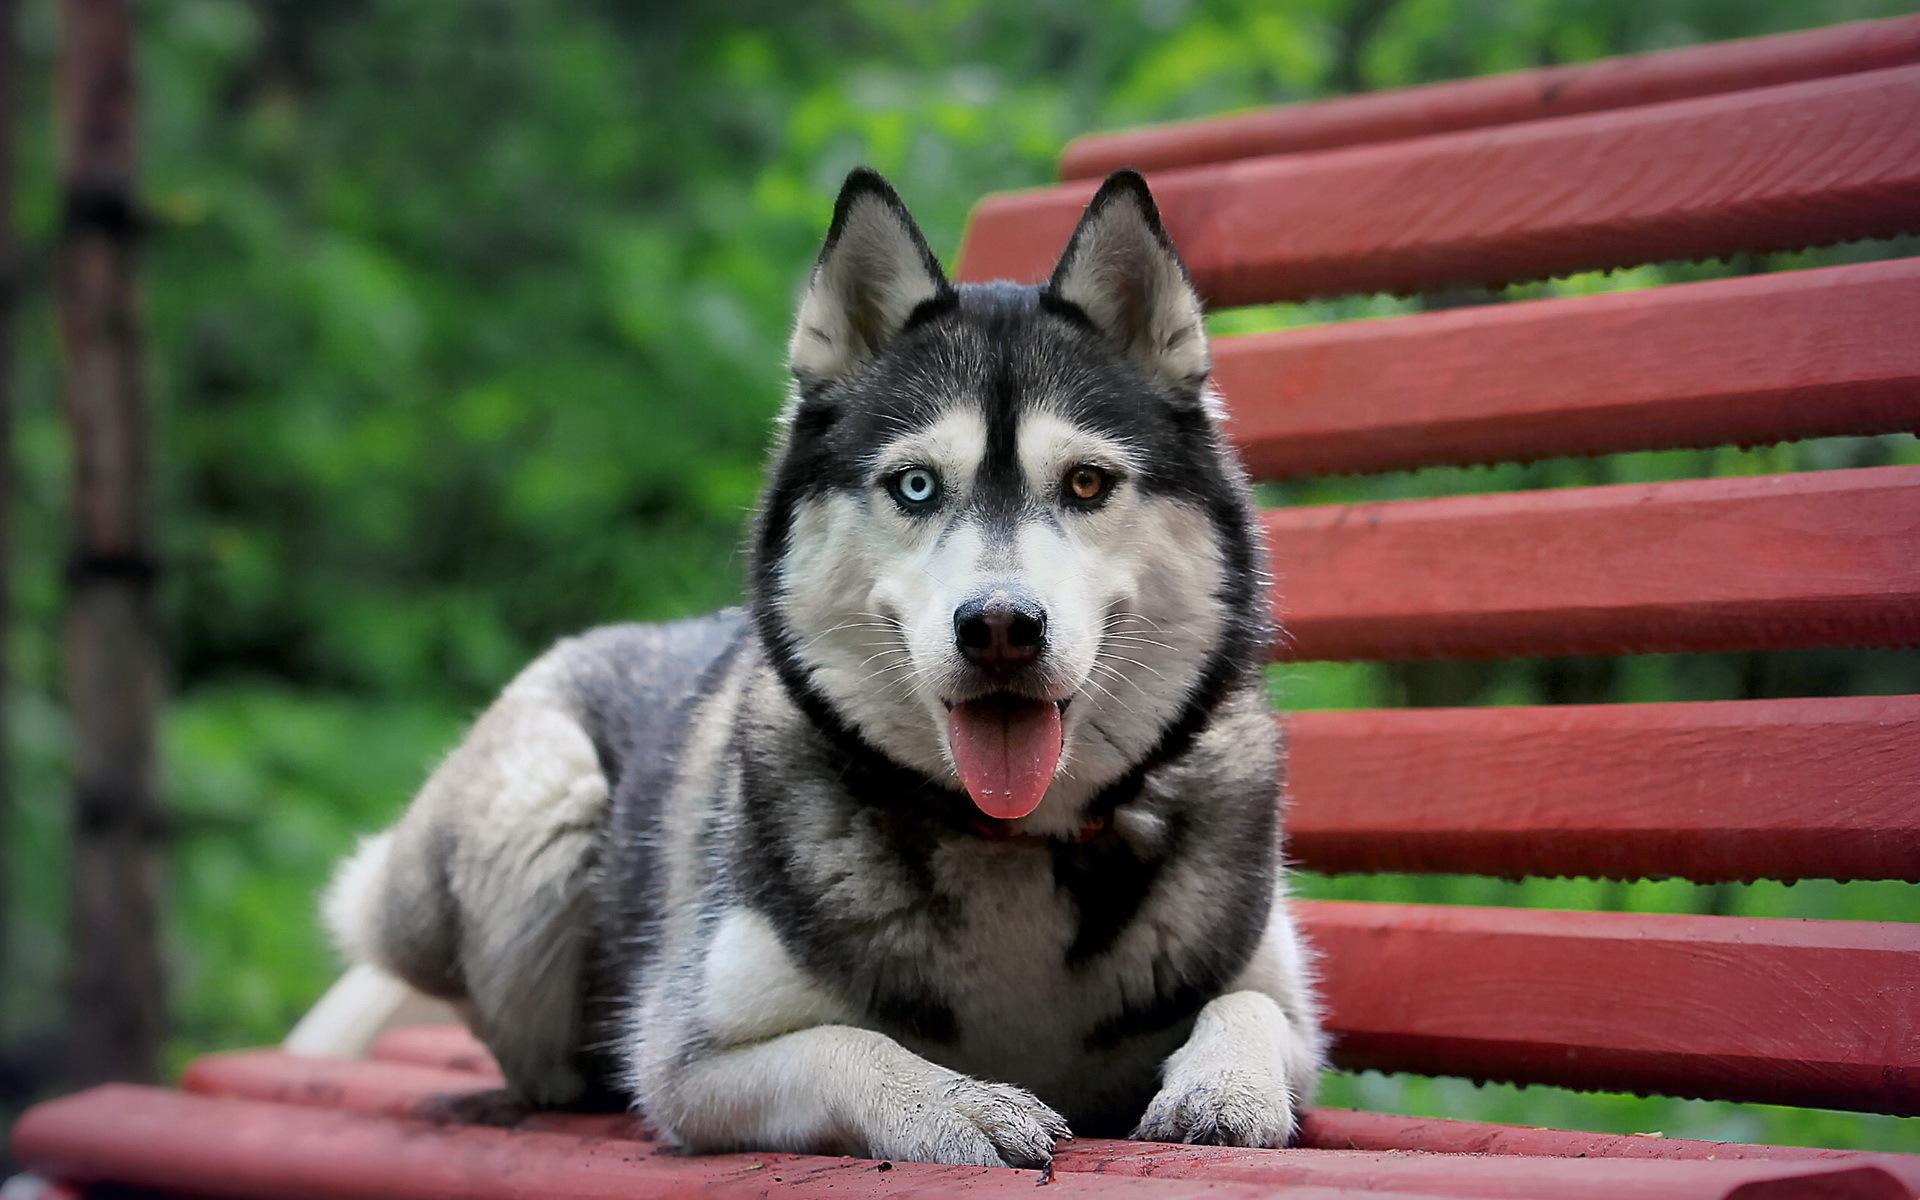 Perros Husky Siberiano Fondos De Pantalla Hd De Animales 2: Fonds D'ecran Chien Husky Sibérien Animaux Télécharger